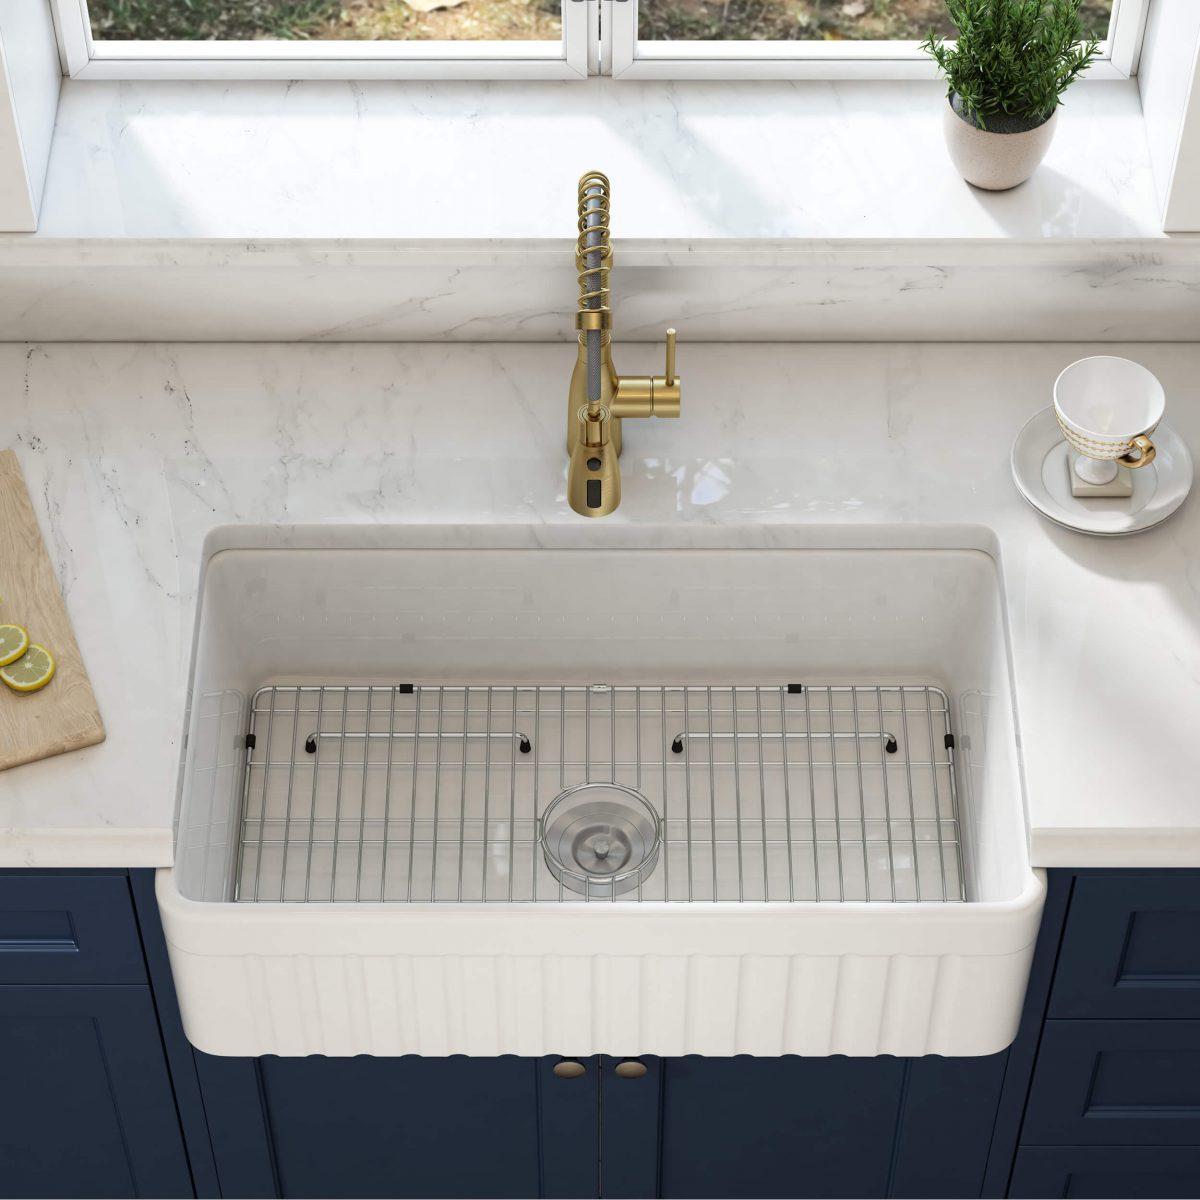 Bathroom Sink Faucet